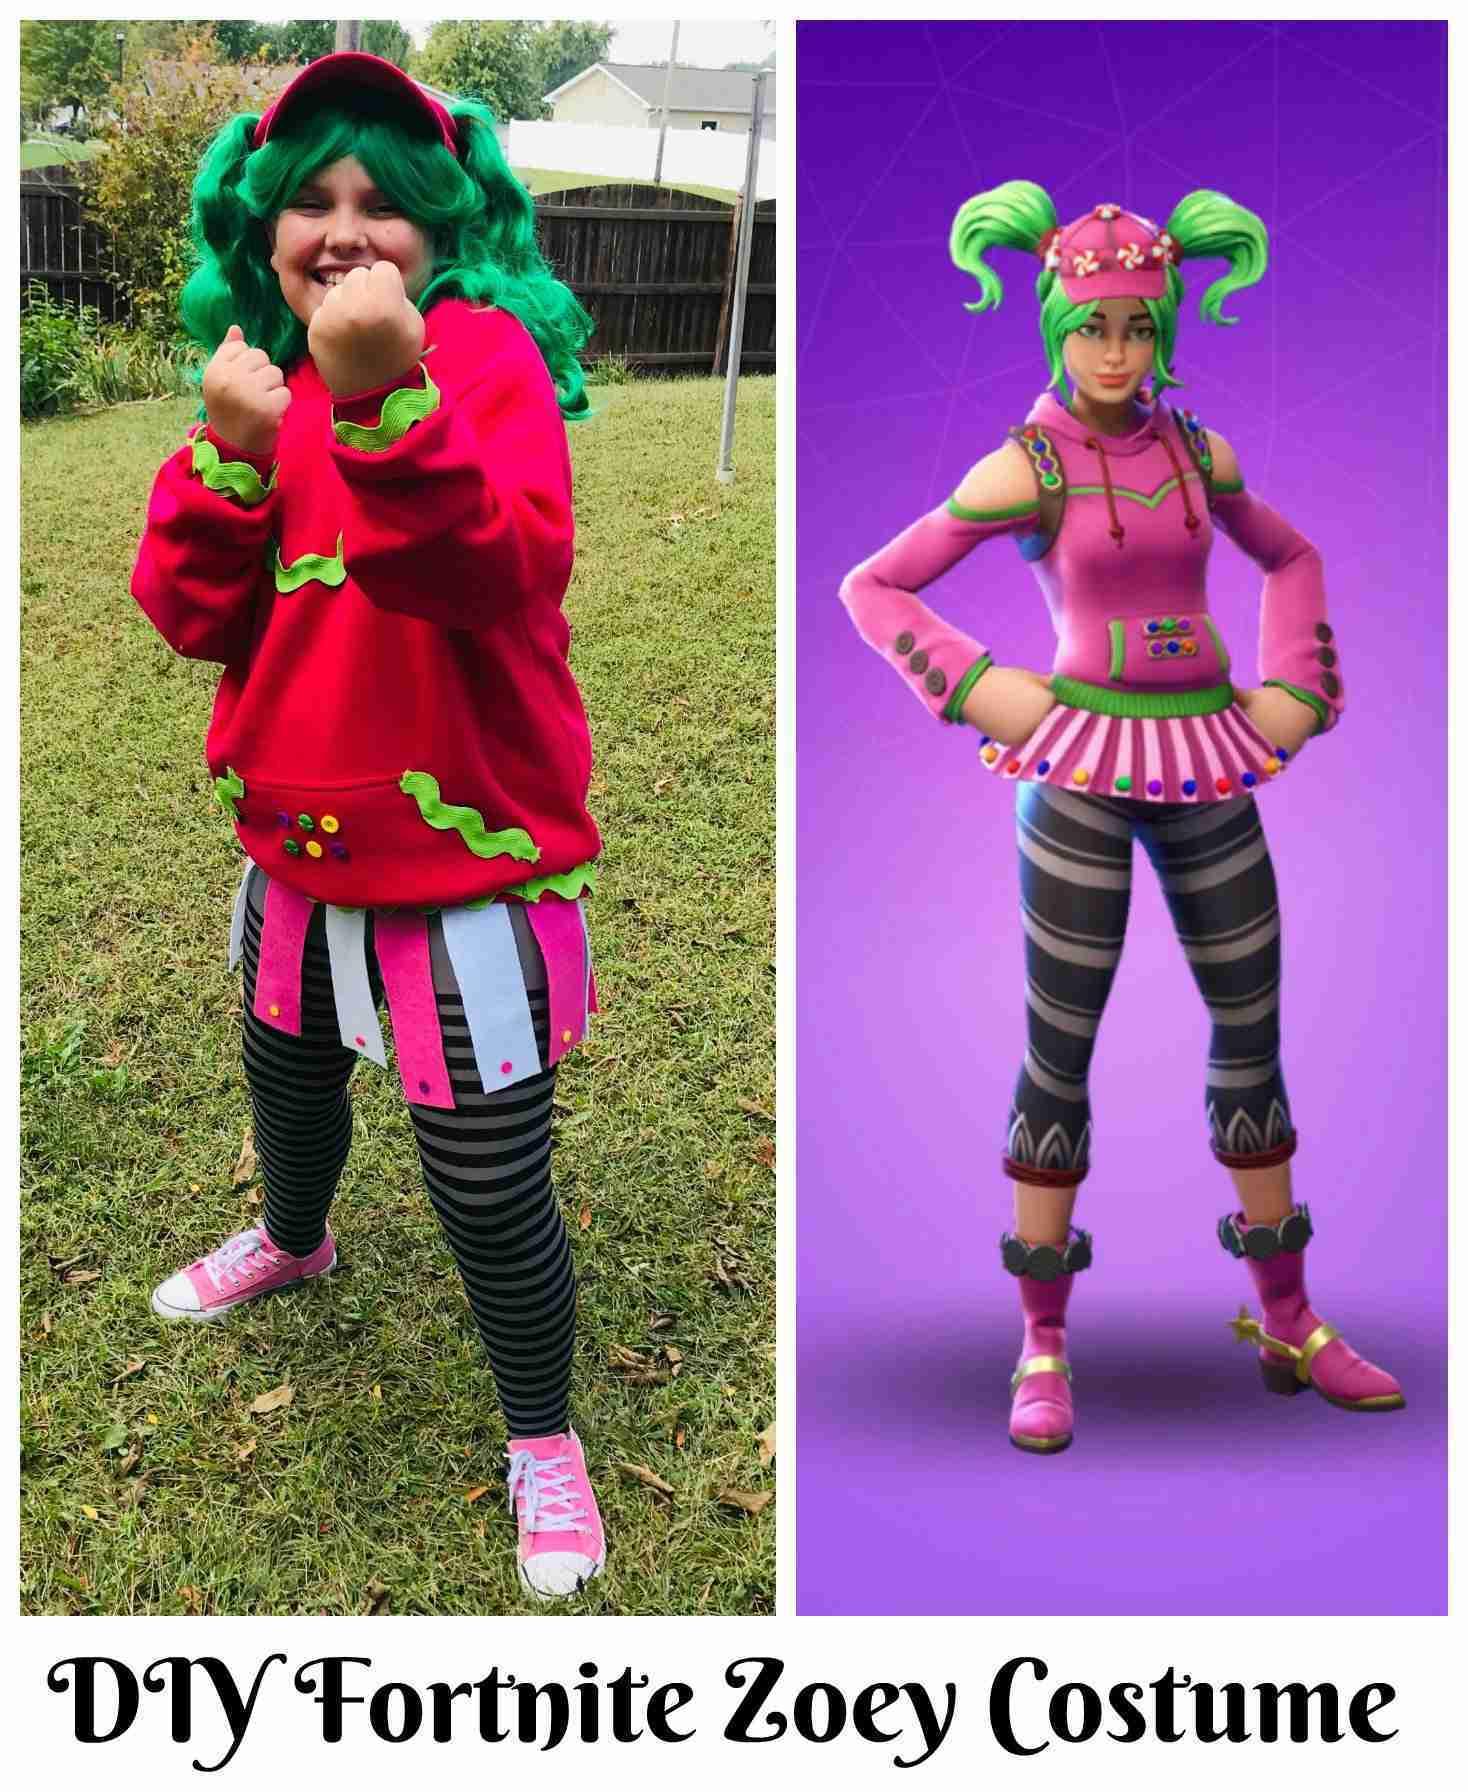 Fortnite Zoey Costume: Easy DIY Halloween Costume